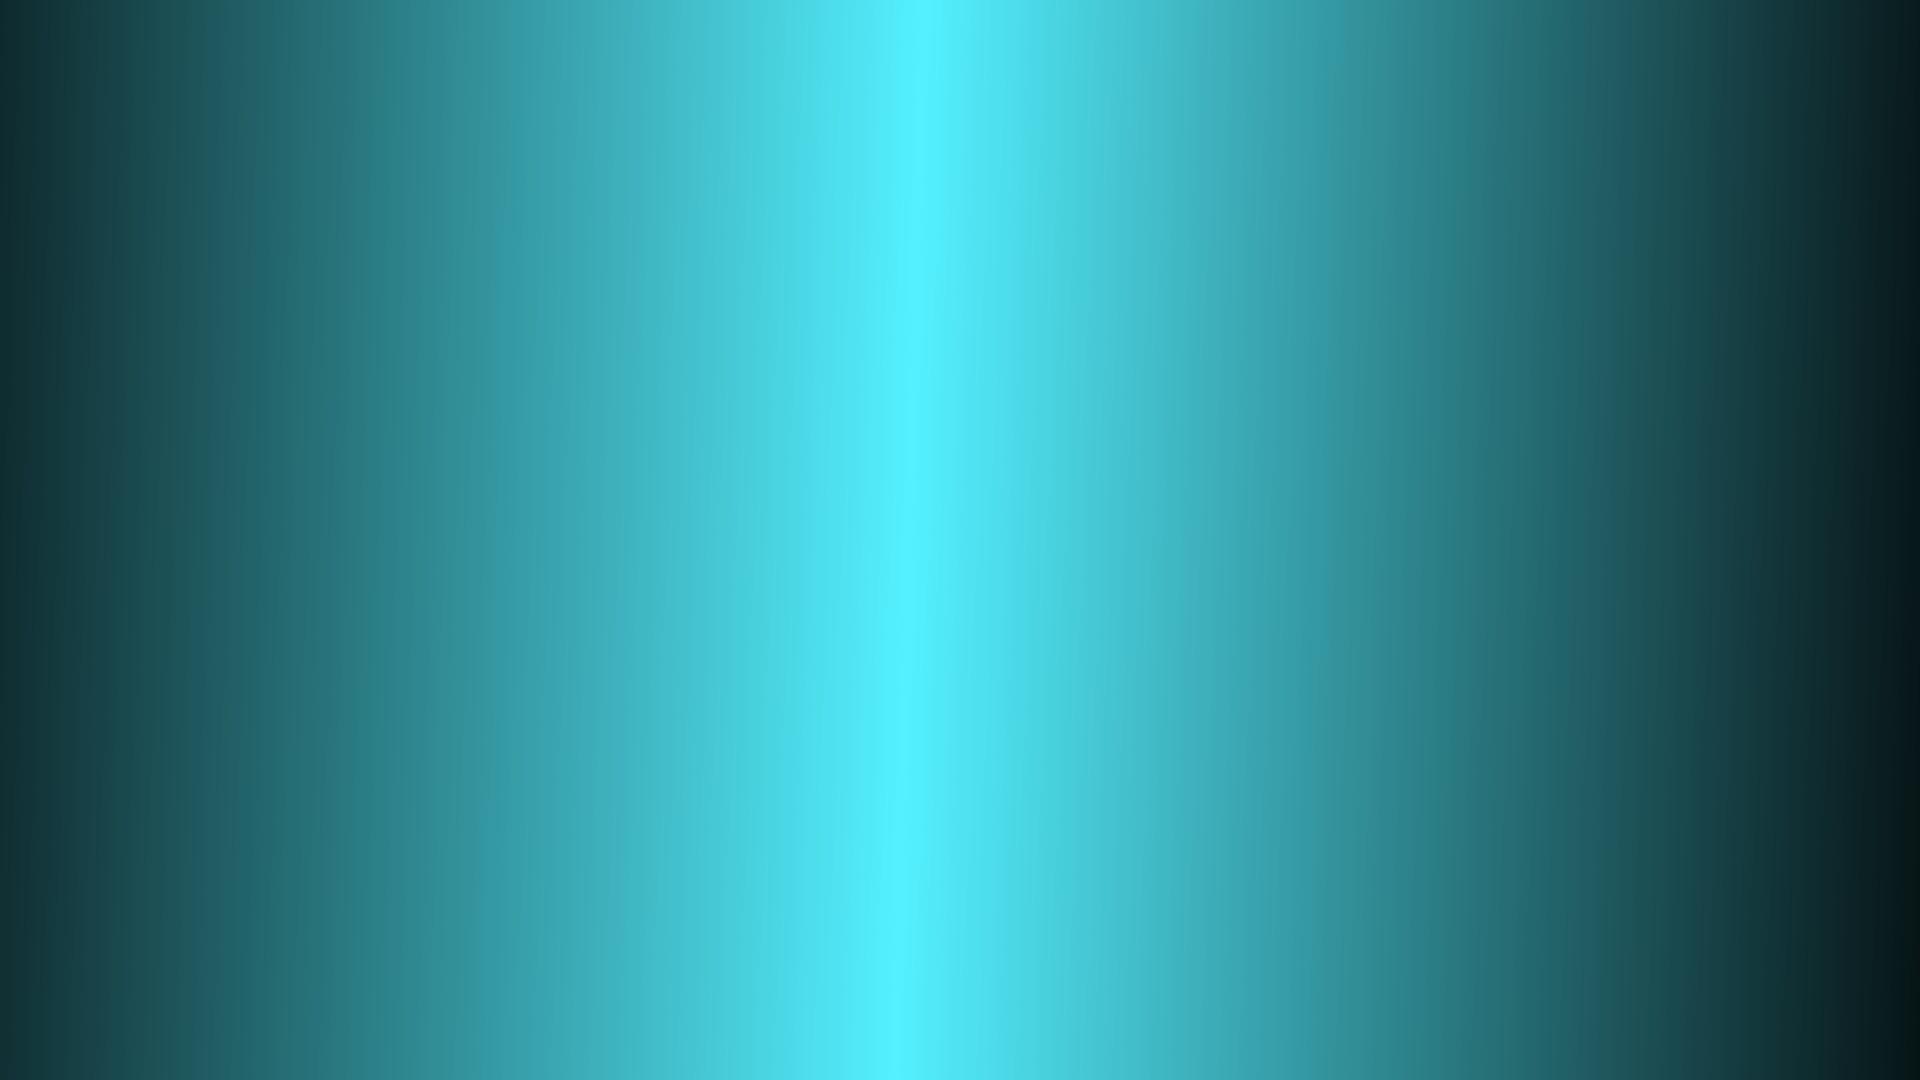 desktop, wallpaper, gradient, black, sky, blue, backgrounds, central